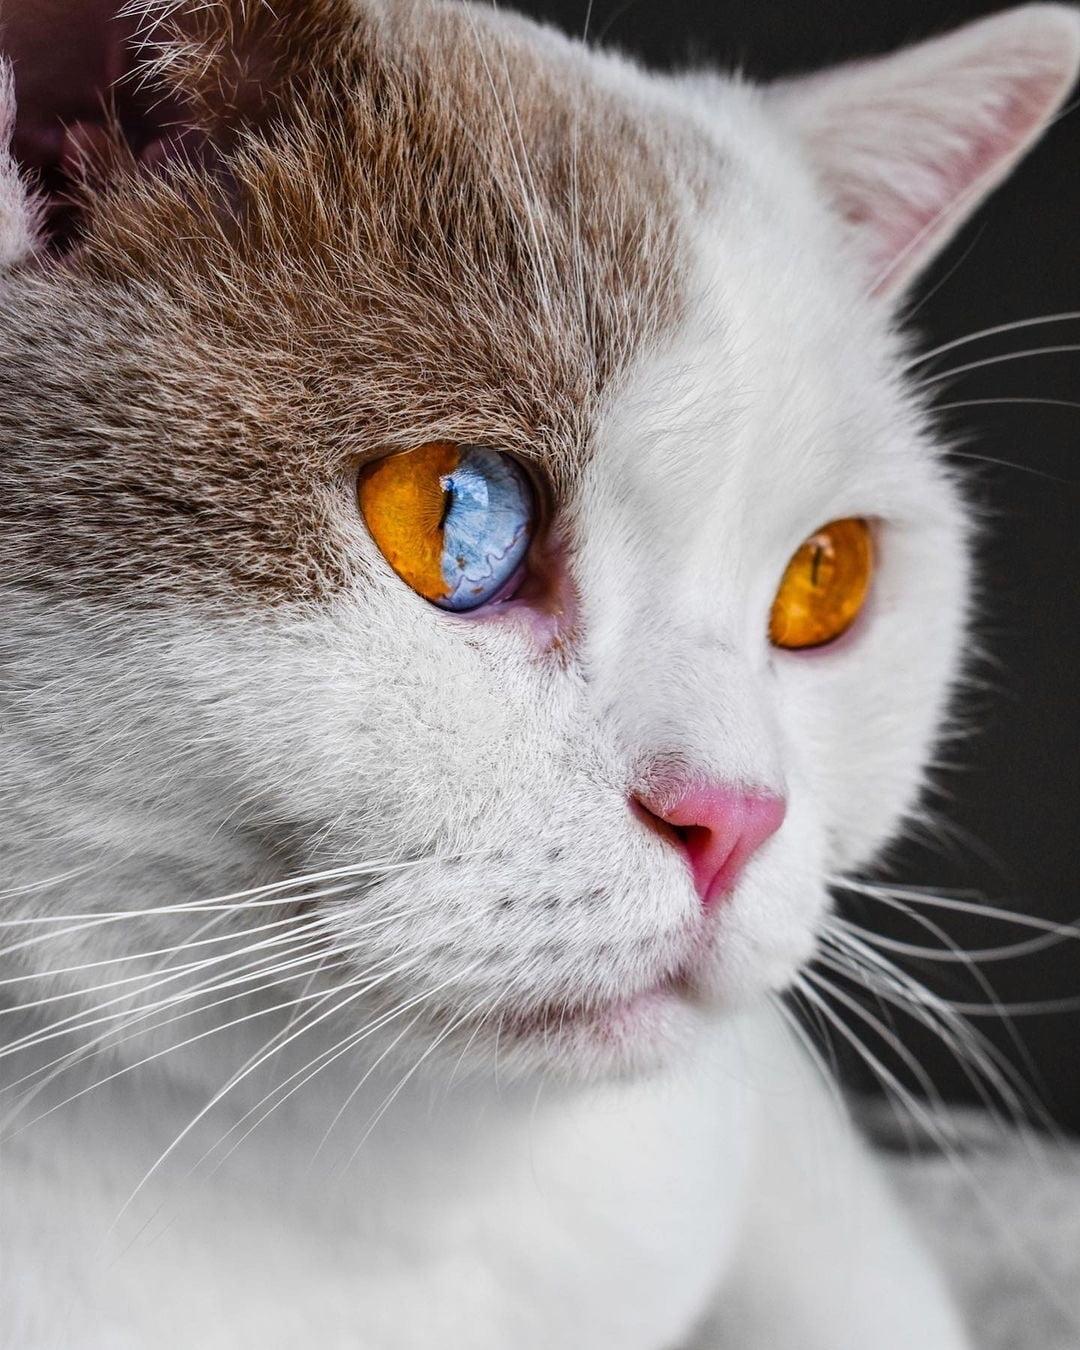 Sectoral heterochromia in a cat